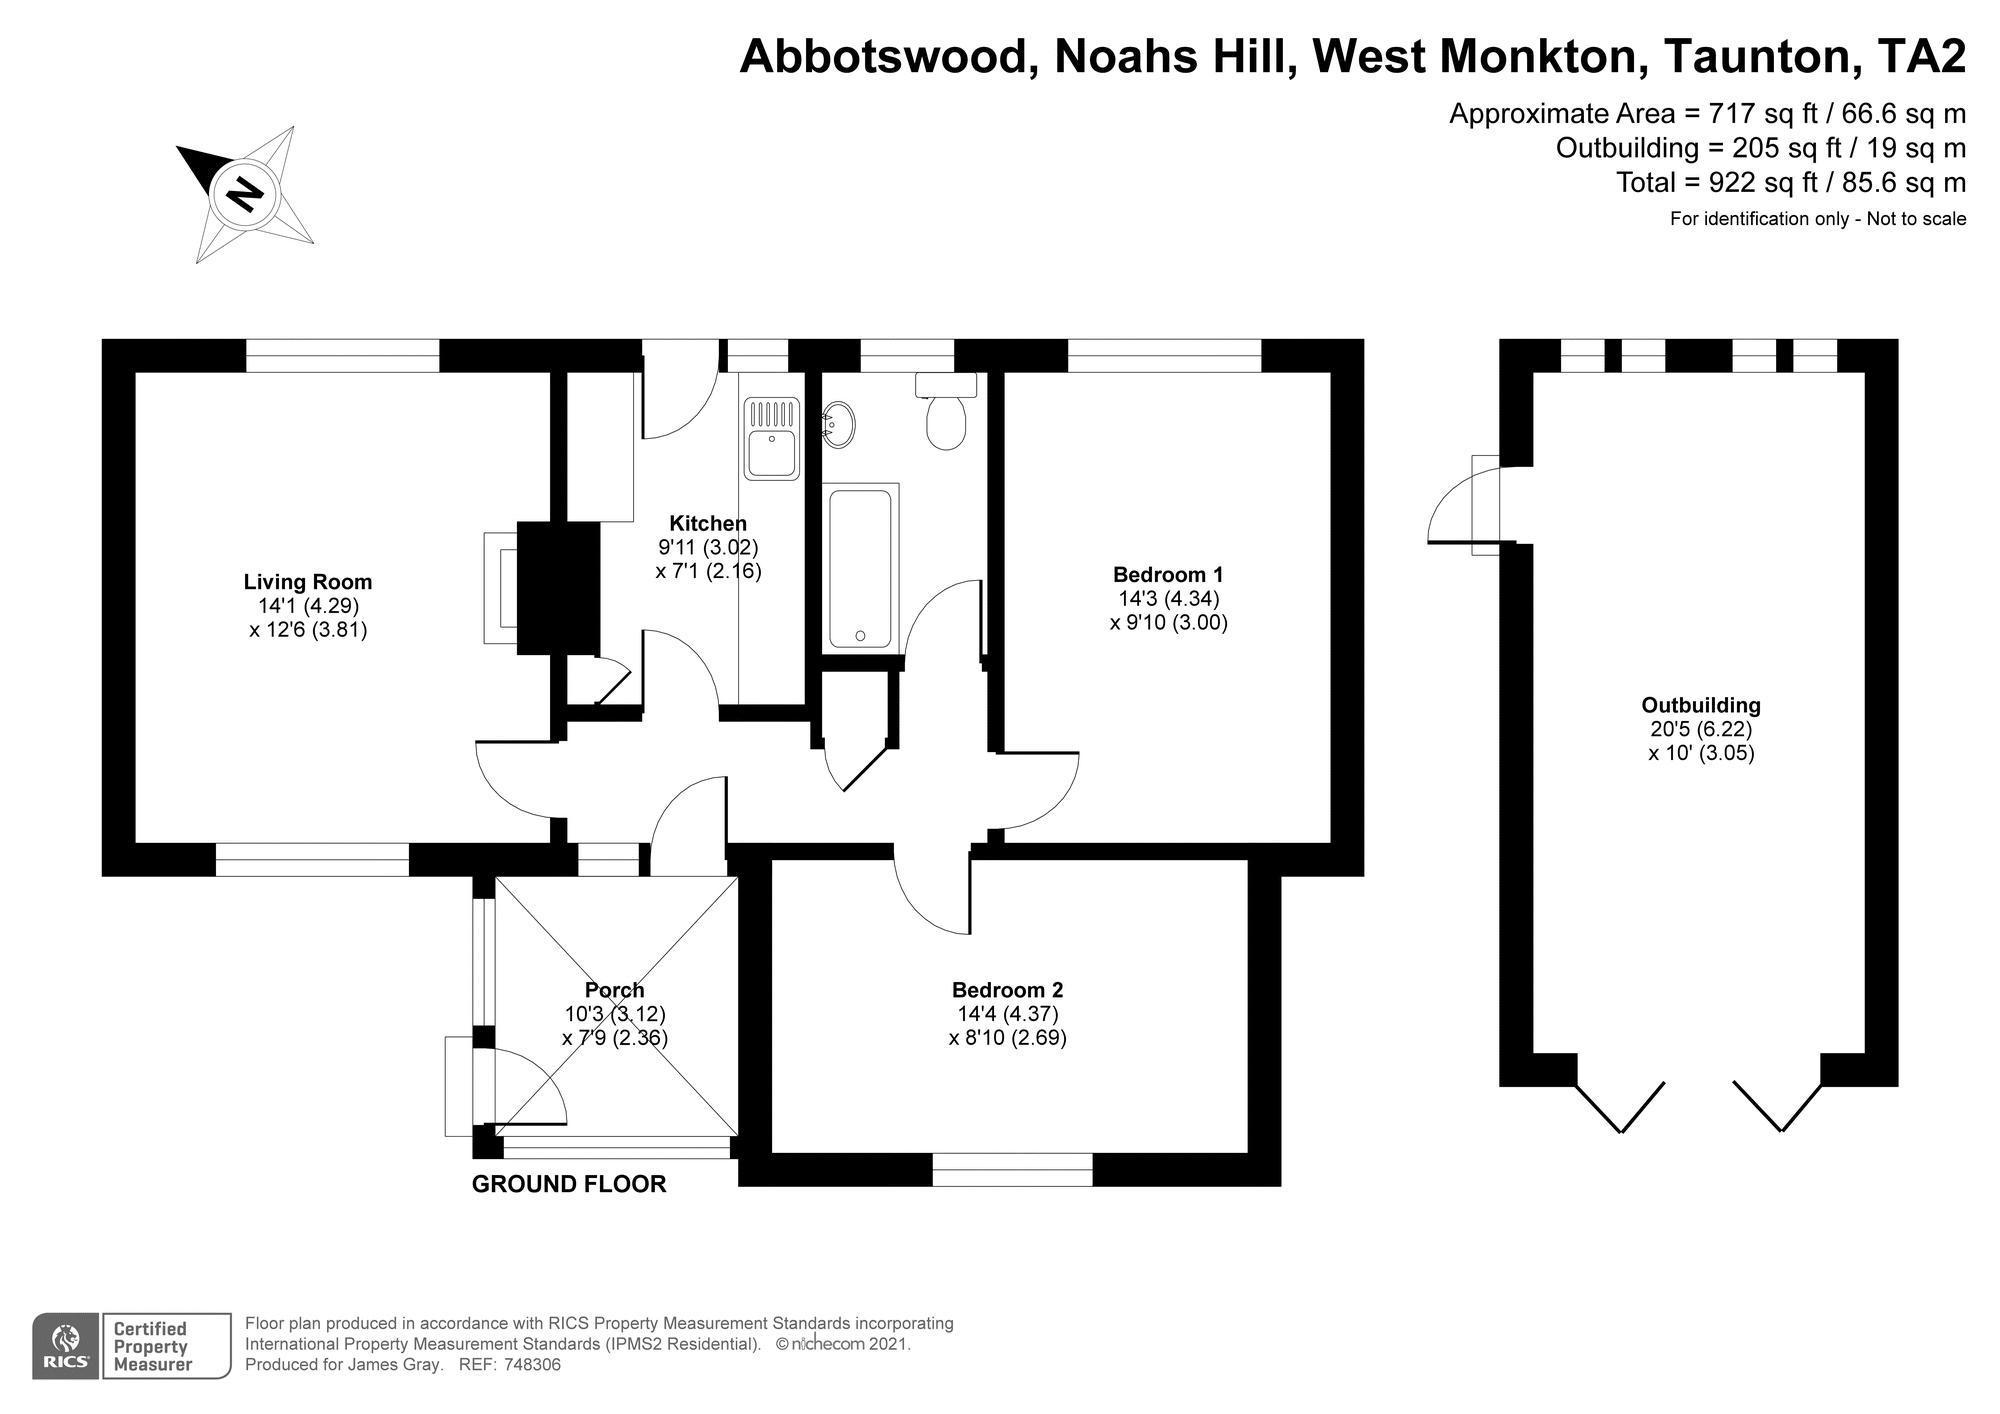 Noahs Hill West Monkton